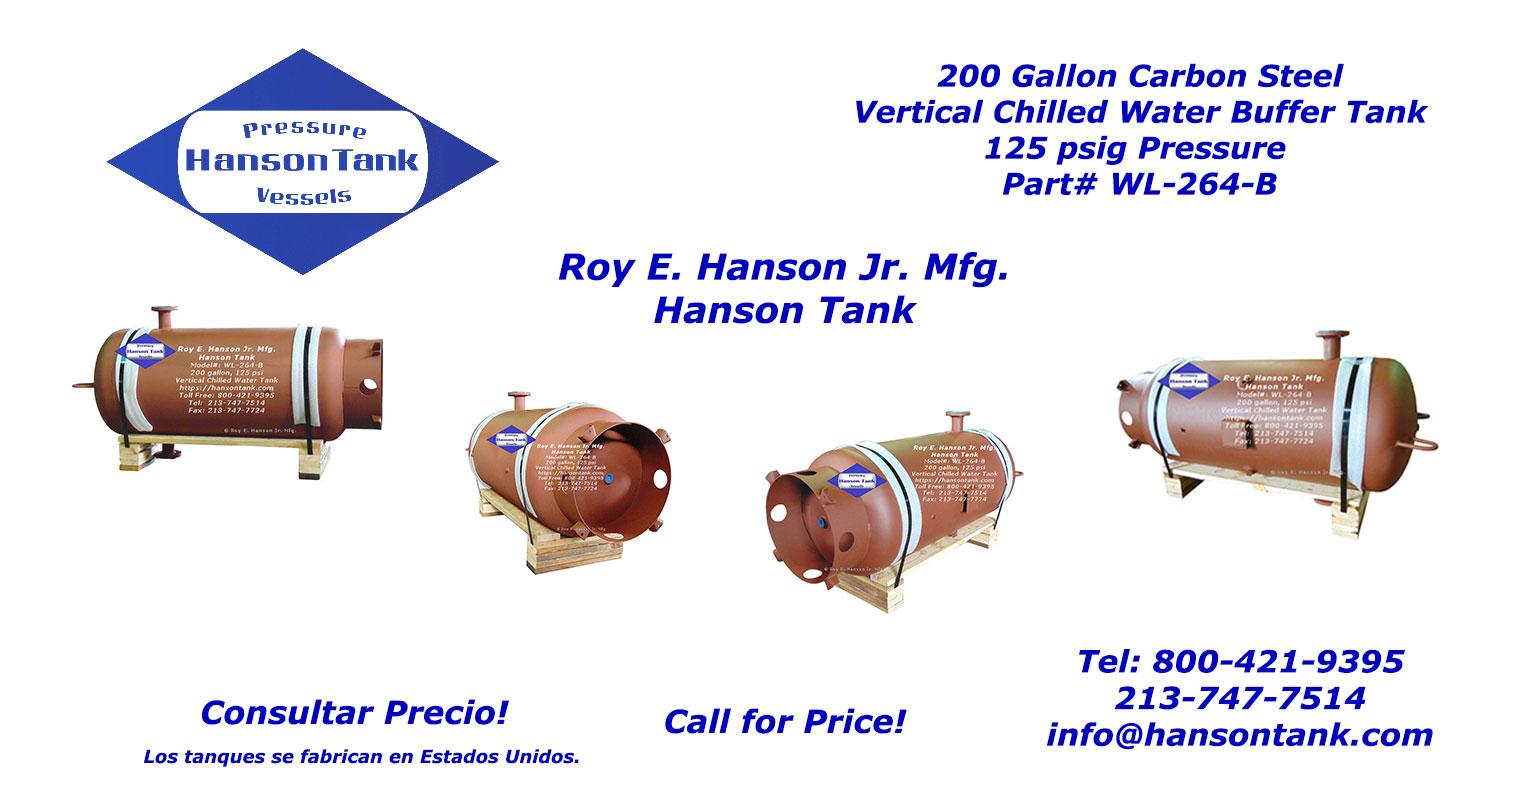 WL-264-L hanson tanques bufer